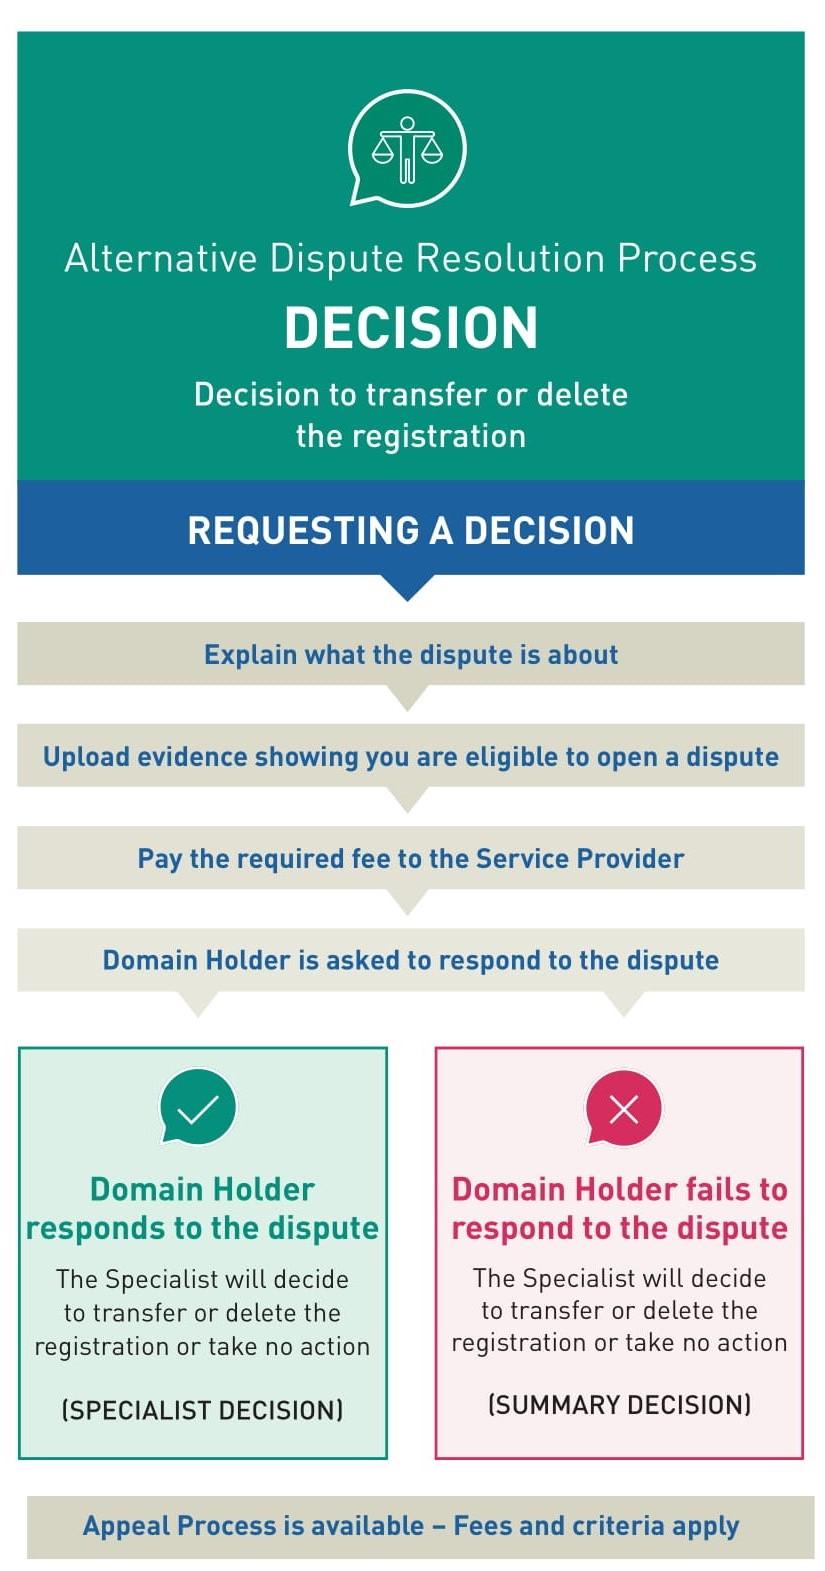 Alternative Dispute Resolution Process Graphic: Decision